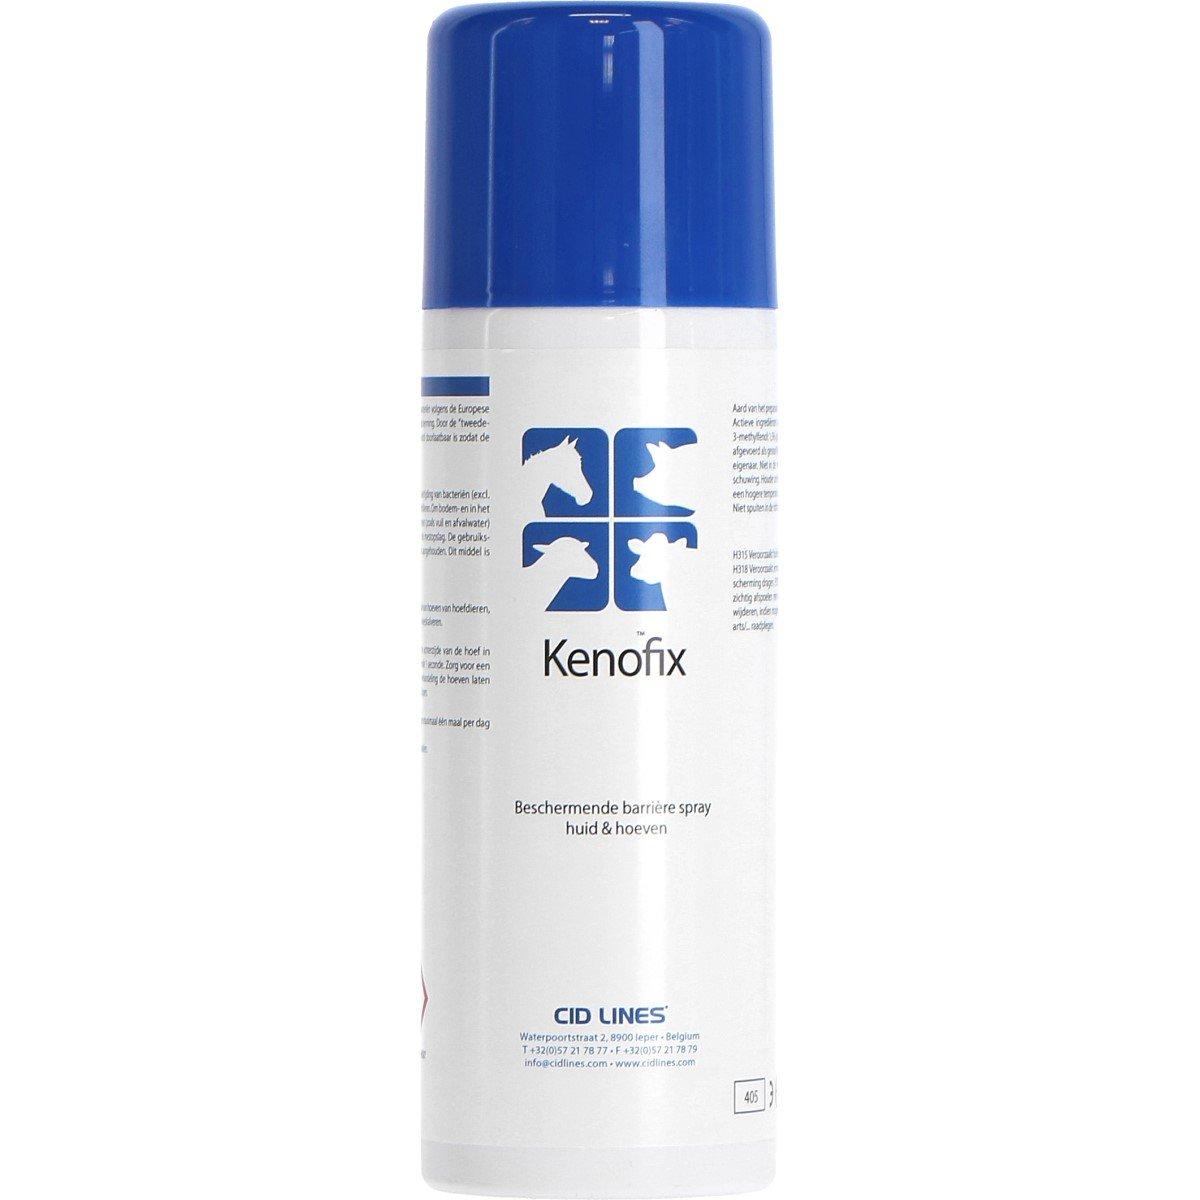 KENOFIX spray 300 ml désinfectant des plaies